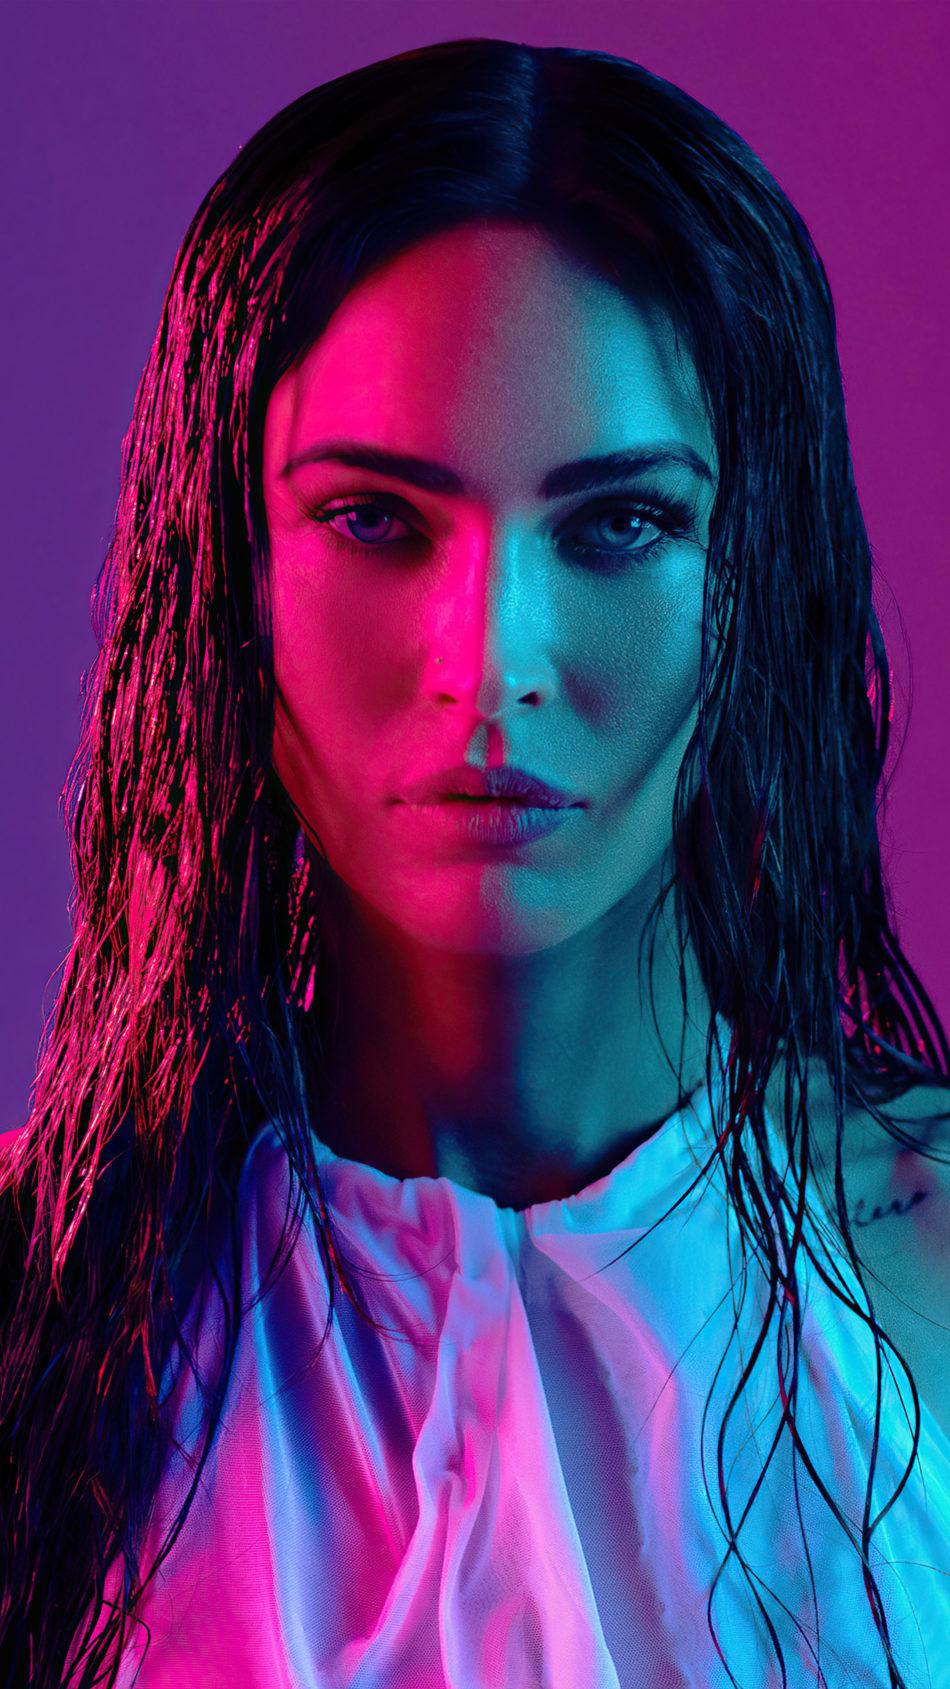 Megan Fox 2021 Neon Photoshoot 4K Ultra HD Mobile Wallpaper